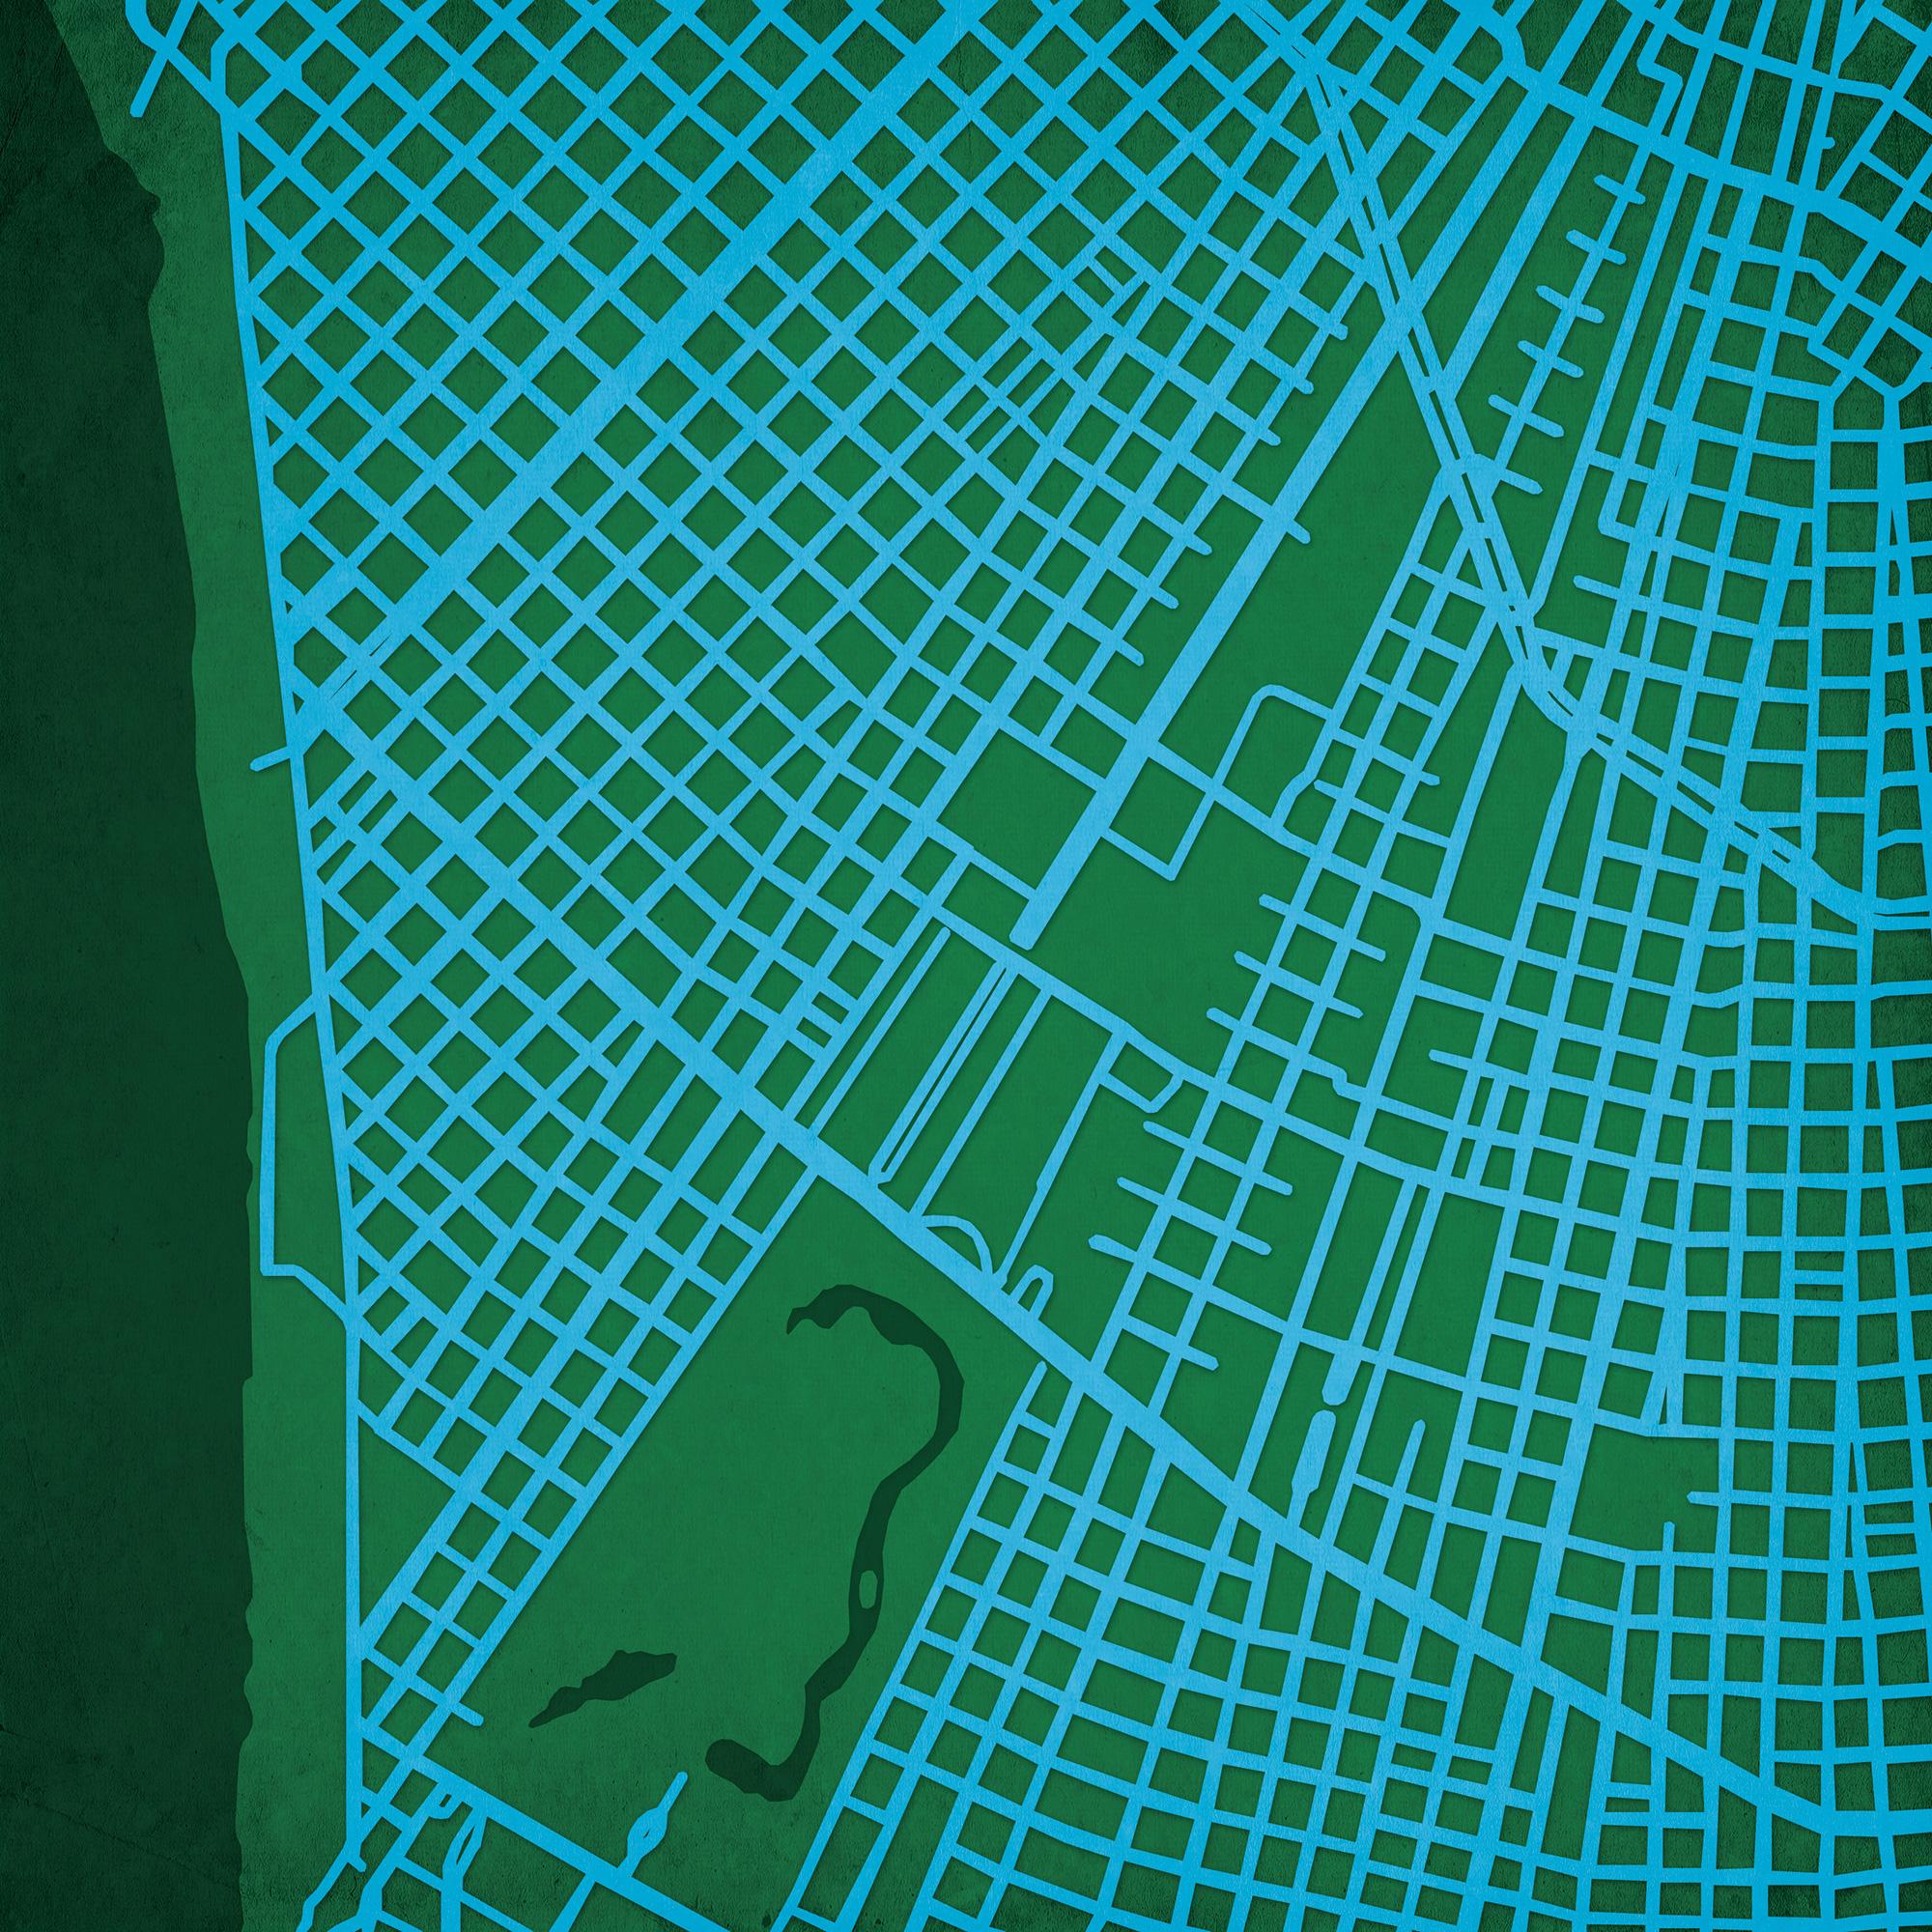 Tulane University Campus Map Art City Prints